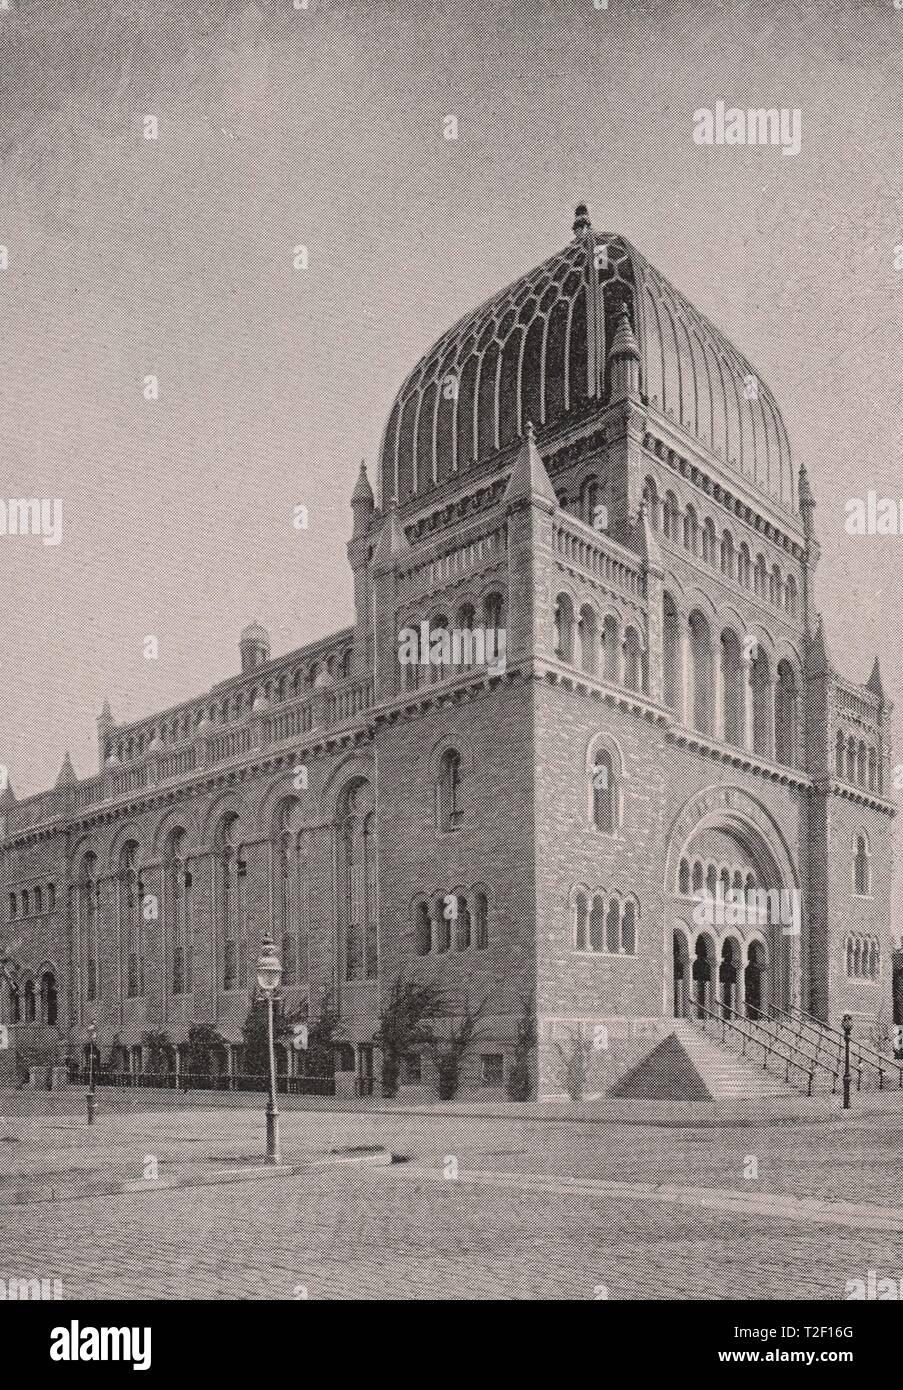 Temple Beth-El, Hebrew-Southeast Corner fifth Avenue and Seventy-Sixth Street - Stock Image